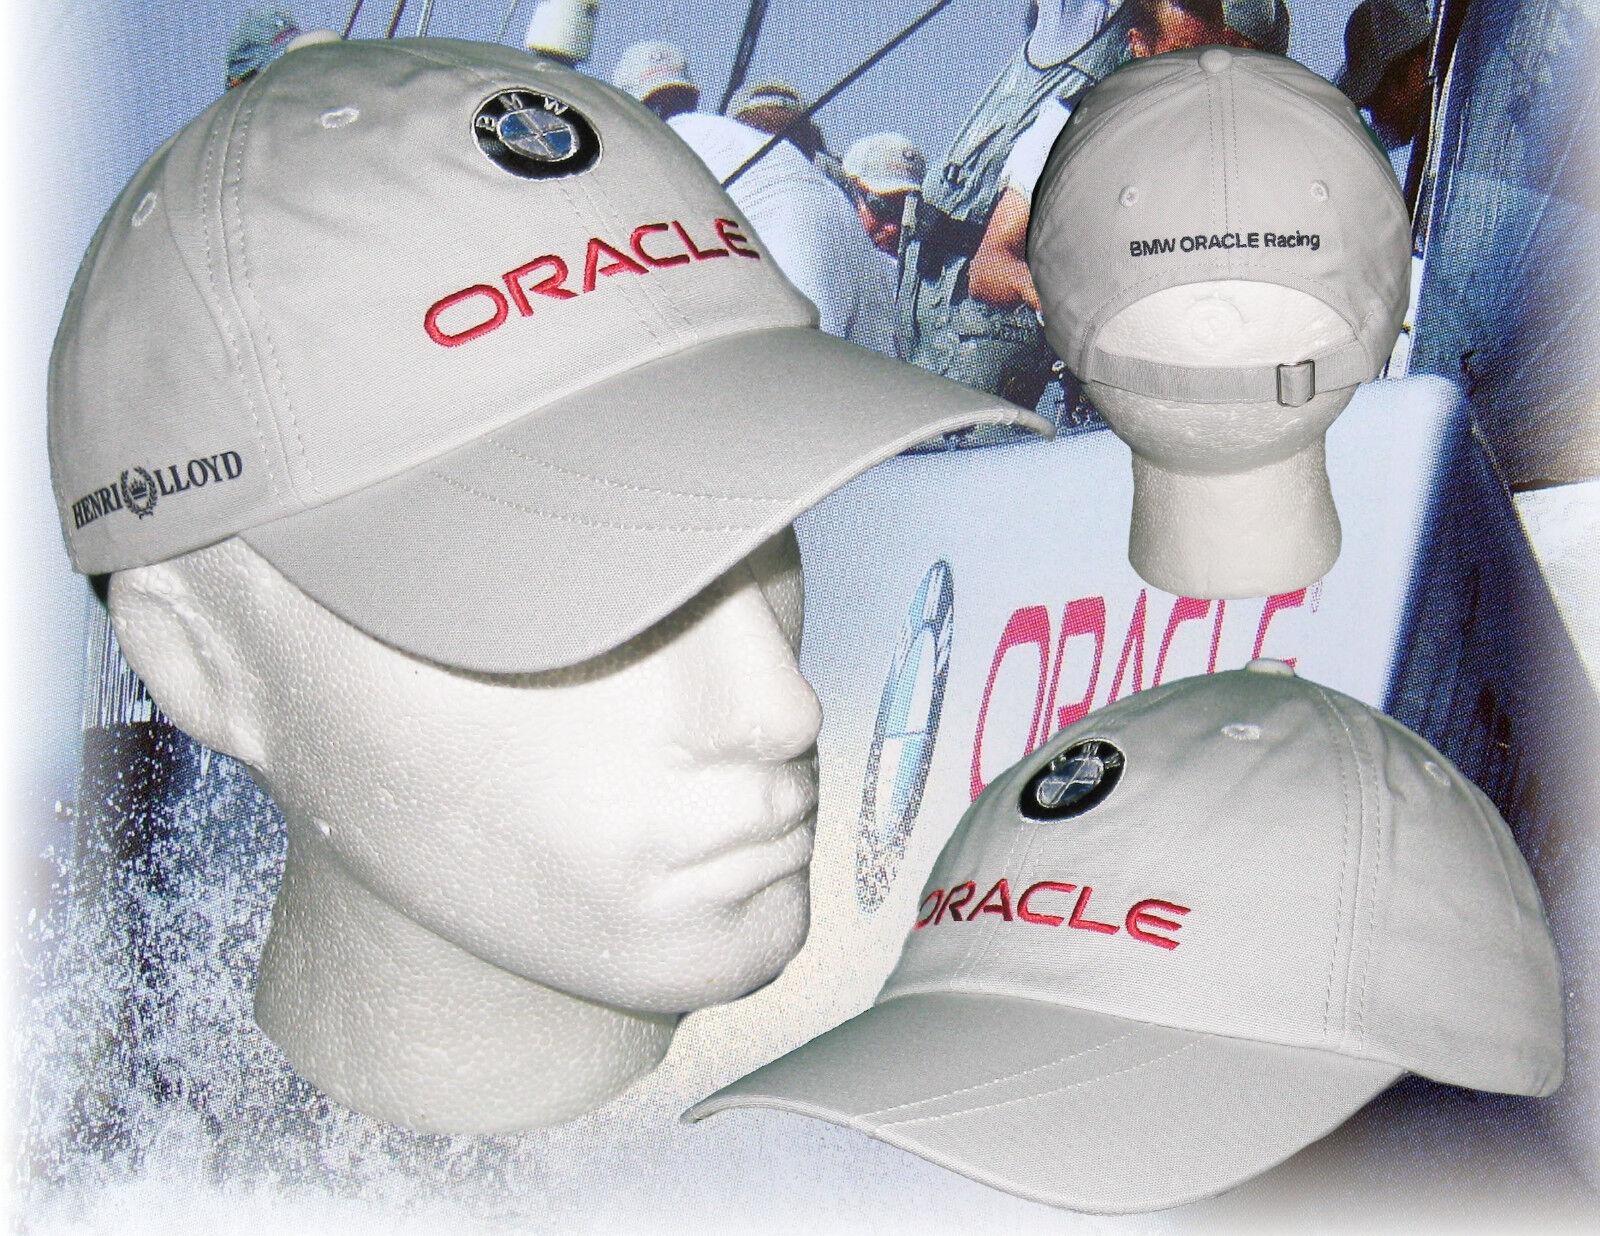 New Vintage Henri Lloyd BMW ORACLE Sailing Racing Adults Baseball Cap Light Grey